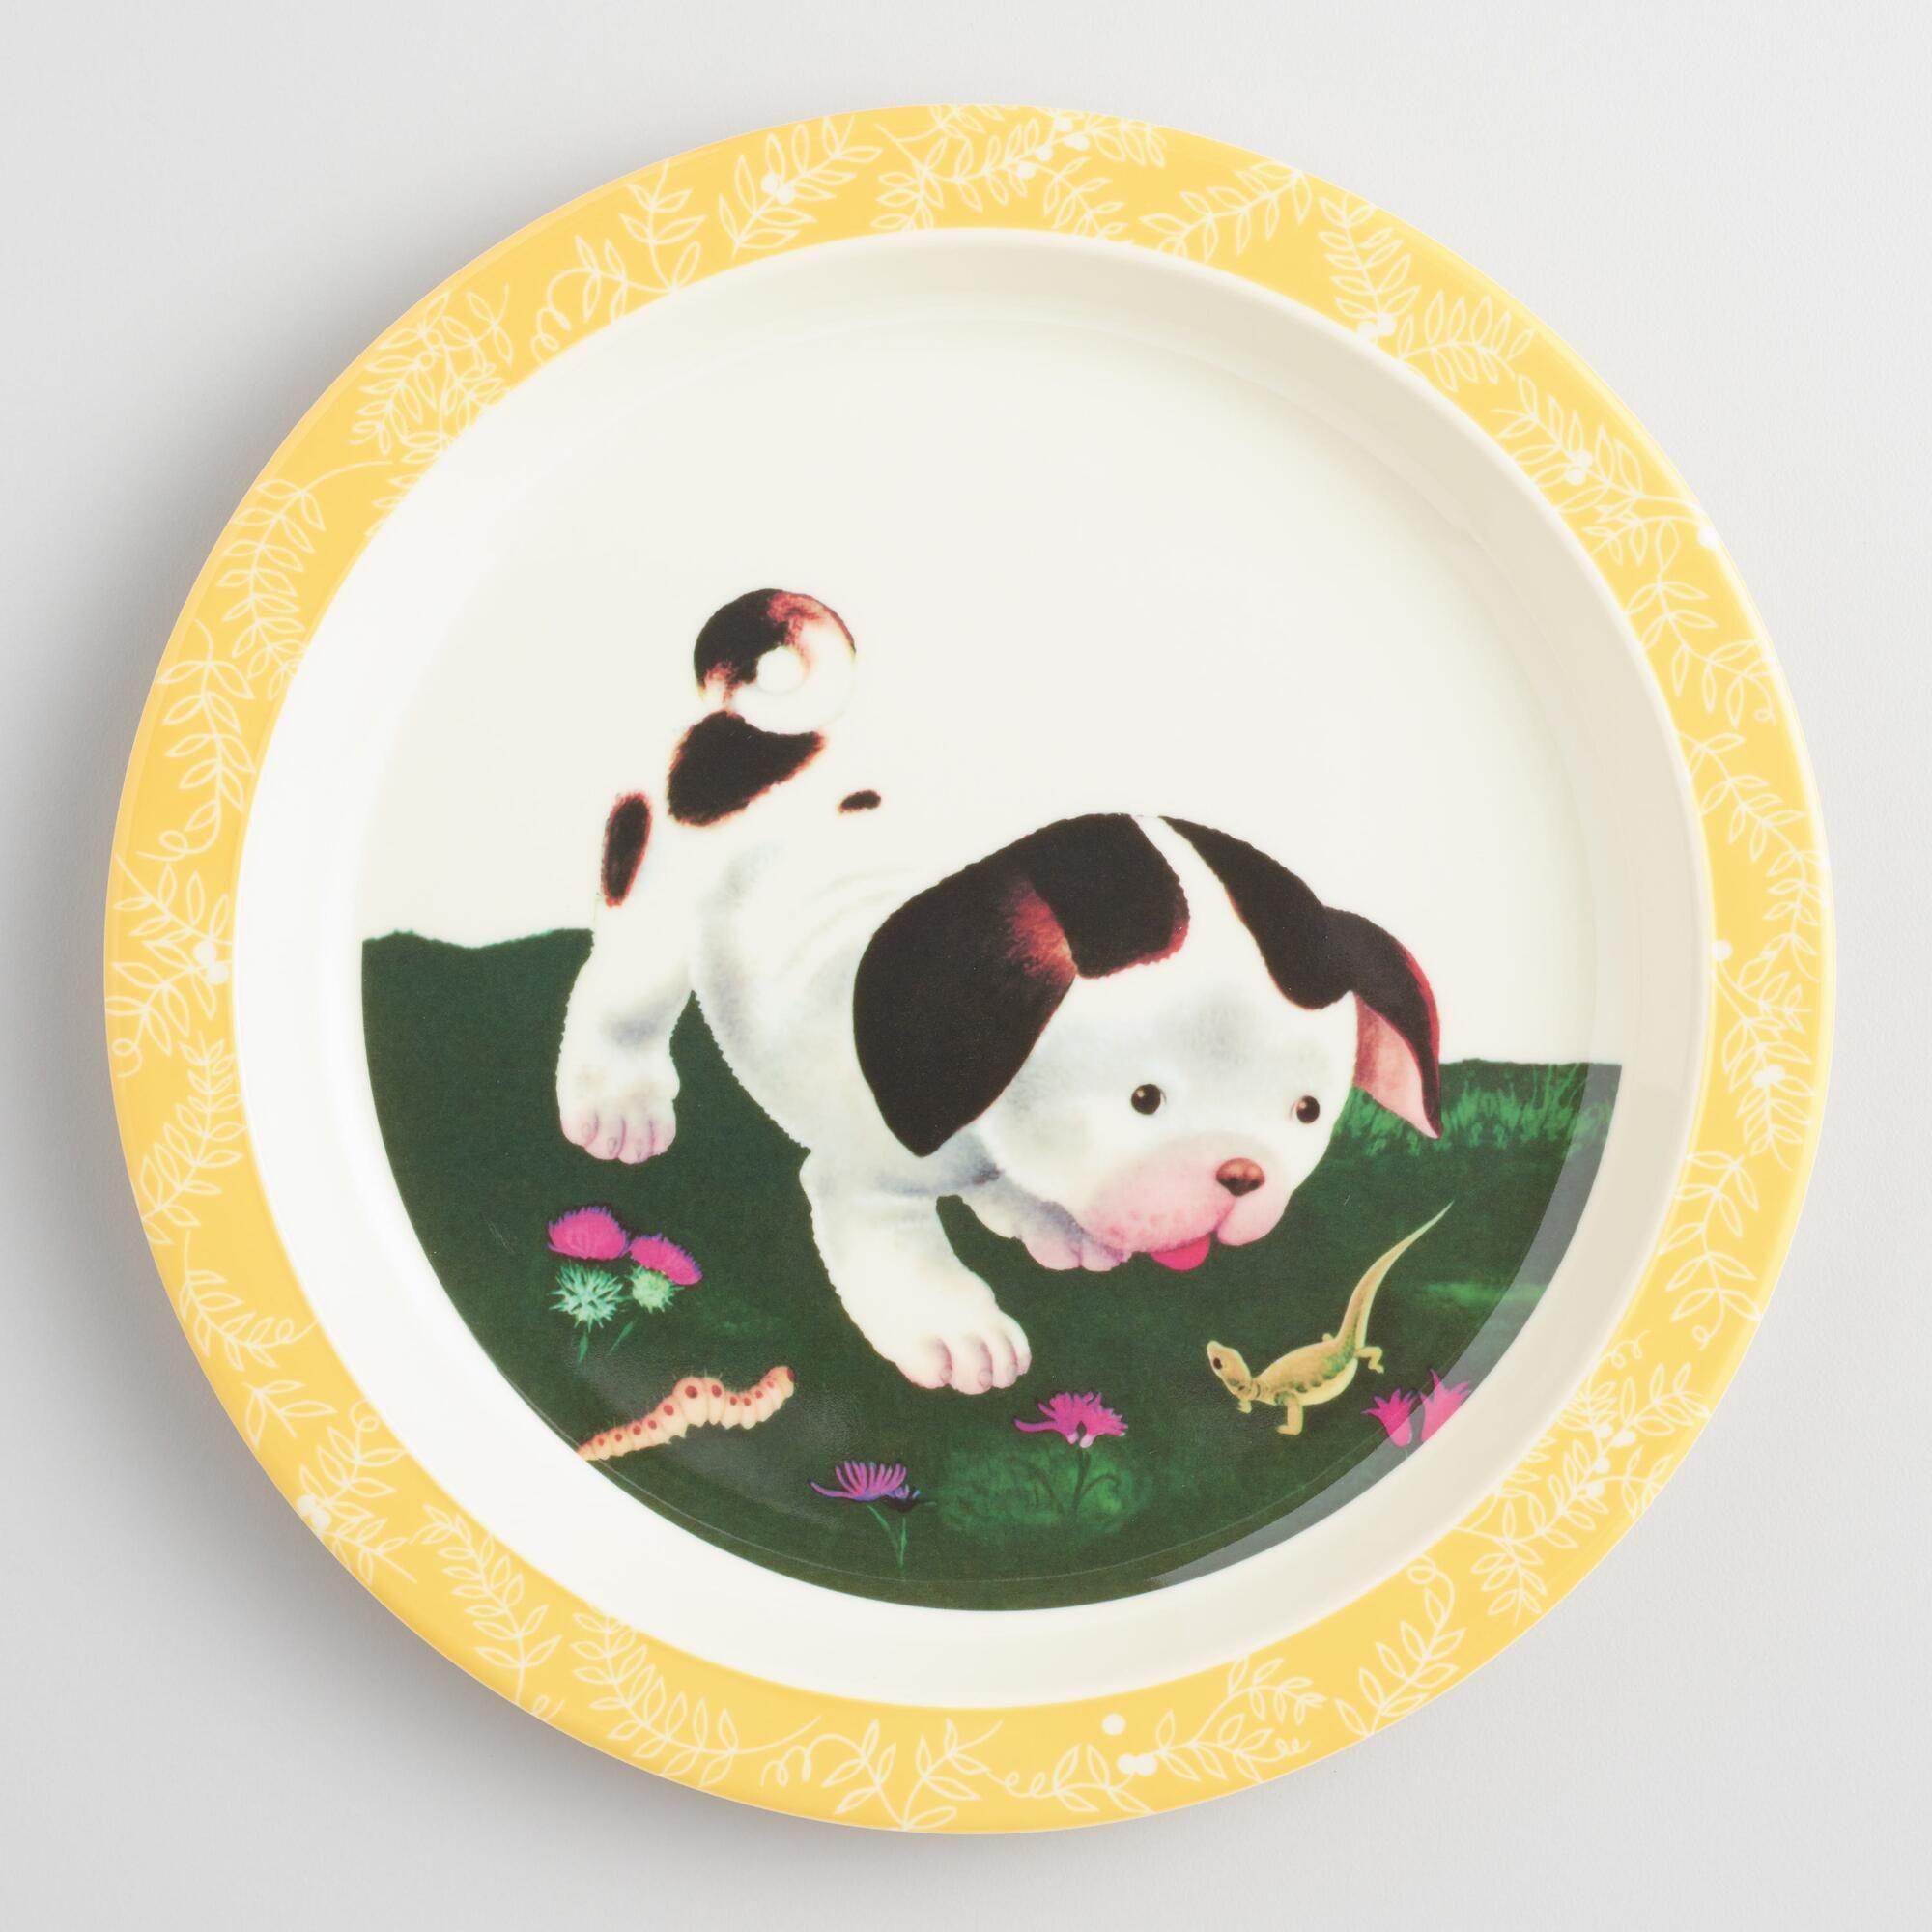 Kids Dinnerware Kids Plates Melamine Plates World Market Dog Books Little Puppies Little Golden Books